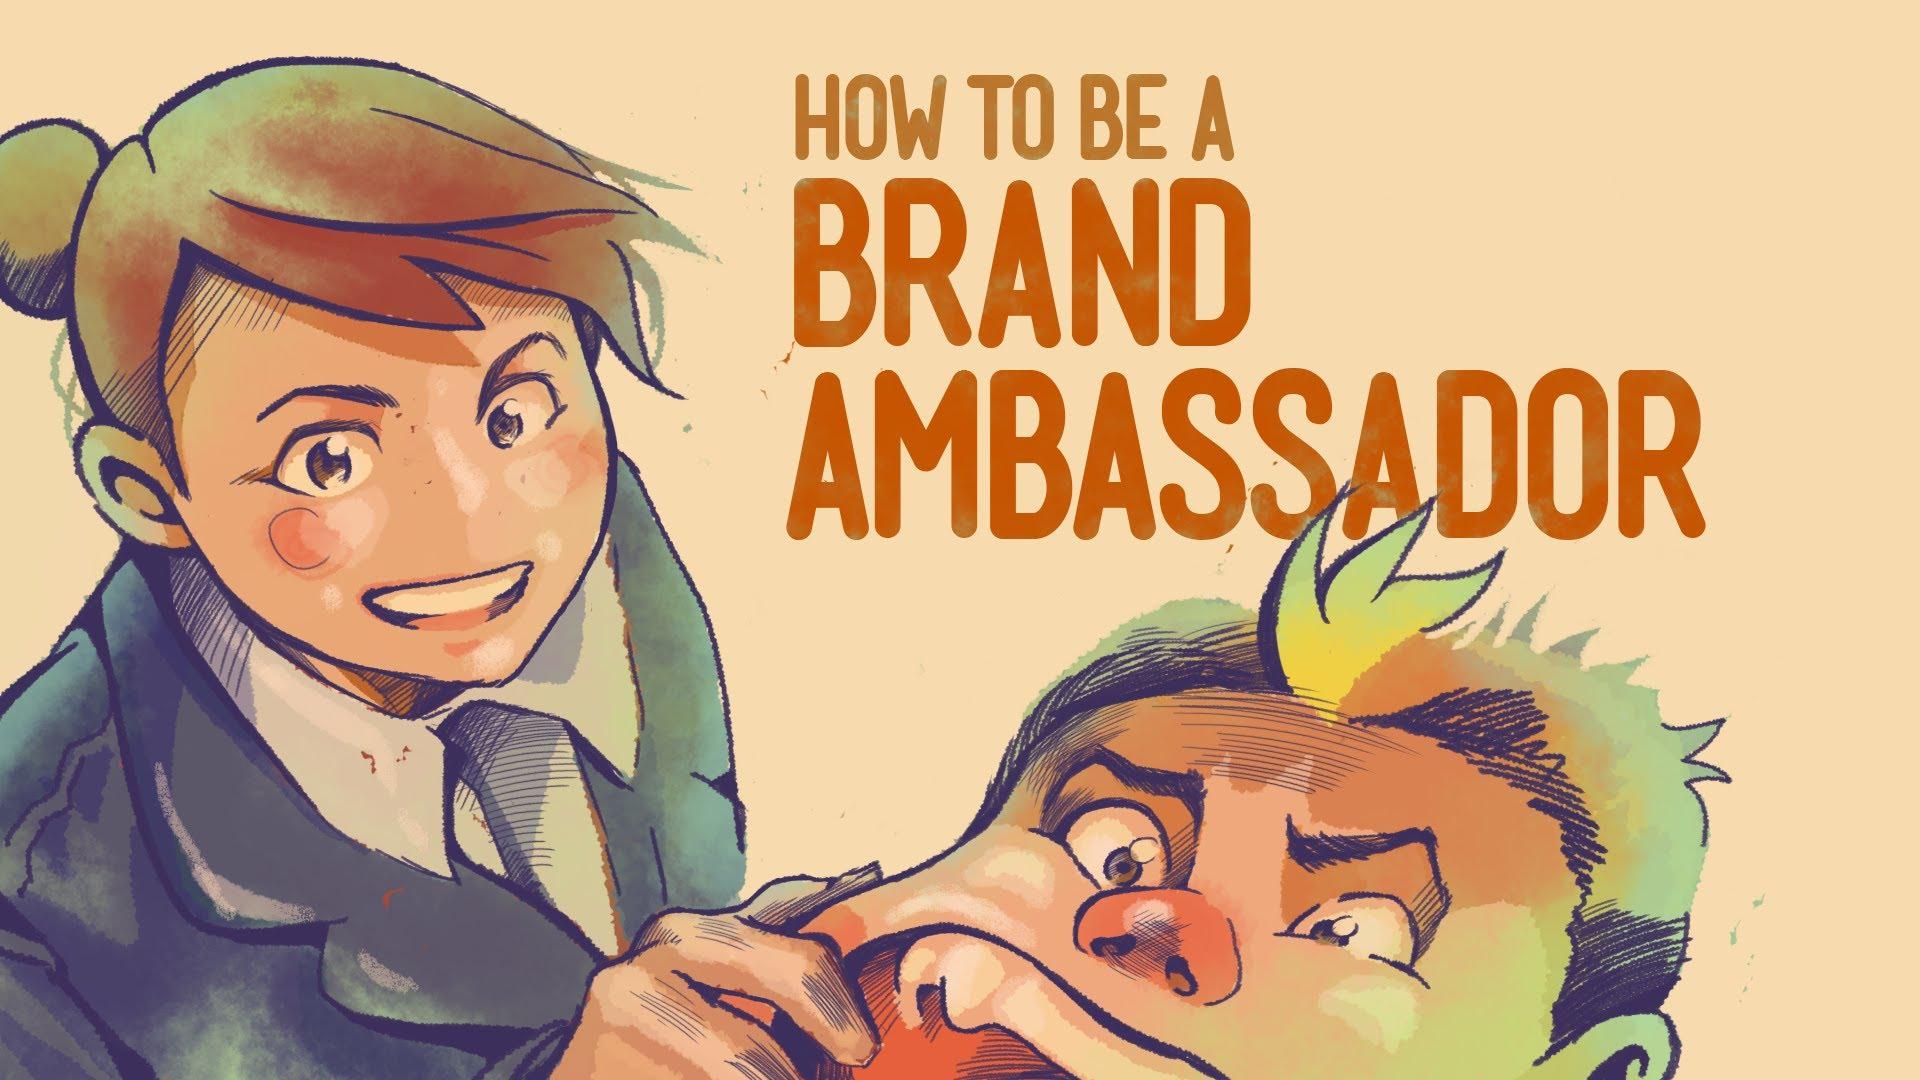 How to Be Brand Ambassador